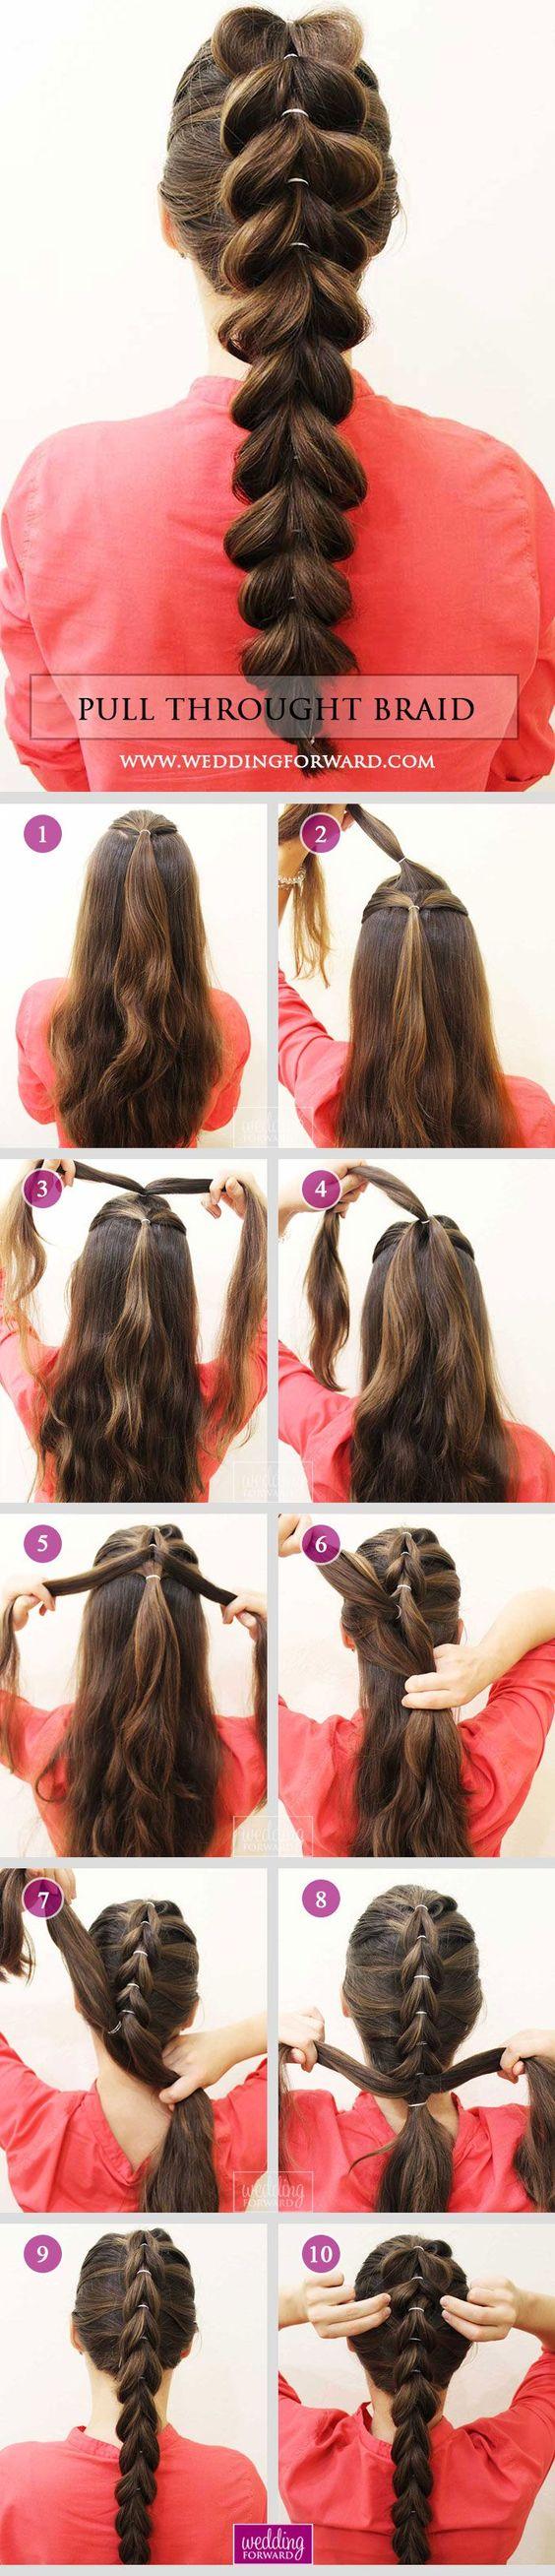 20 Peinados Con Trenza Paso A Paso Como Organizar La Casa